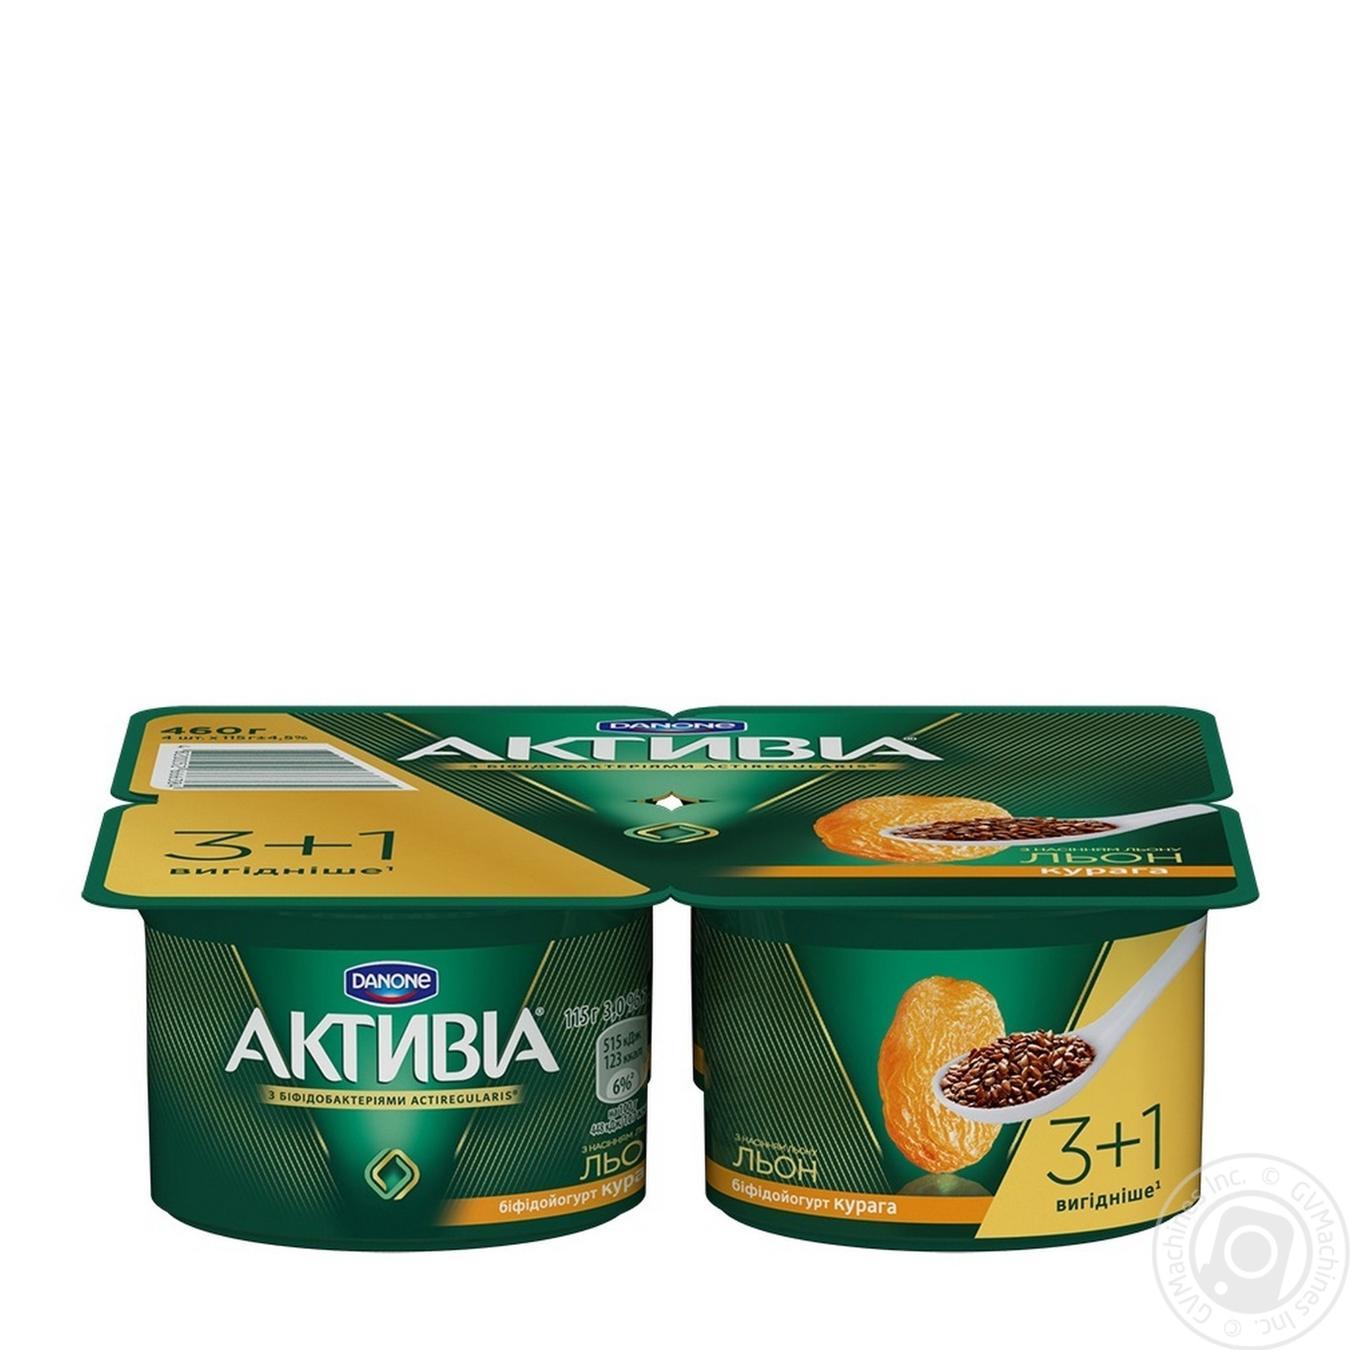 ACTIVIA ЙОГУРТ 4X115Г КУРАГА-ЛЬОН